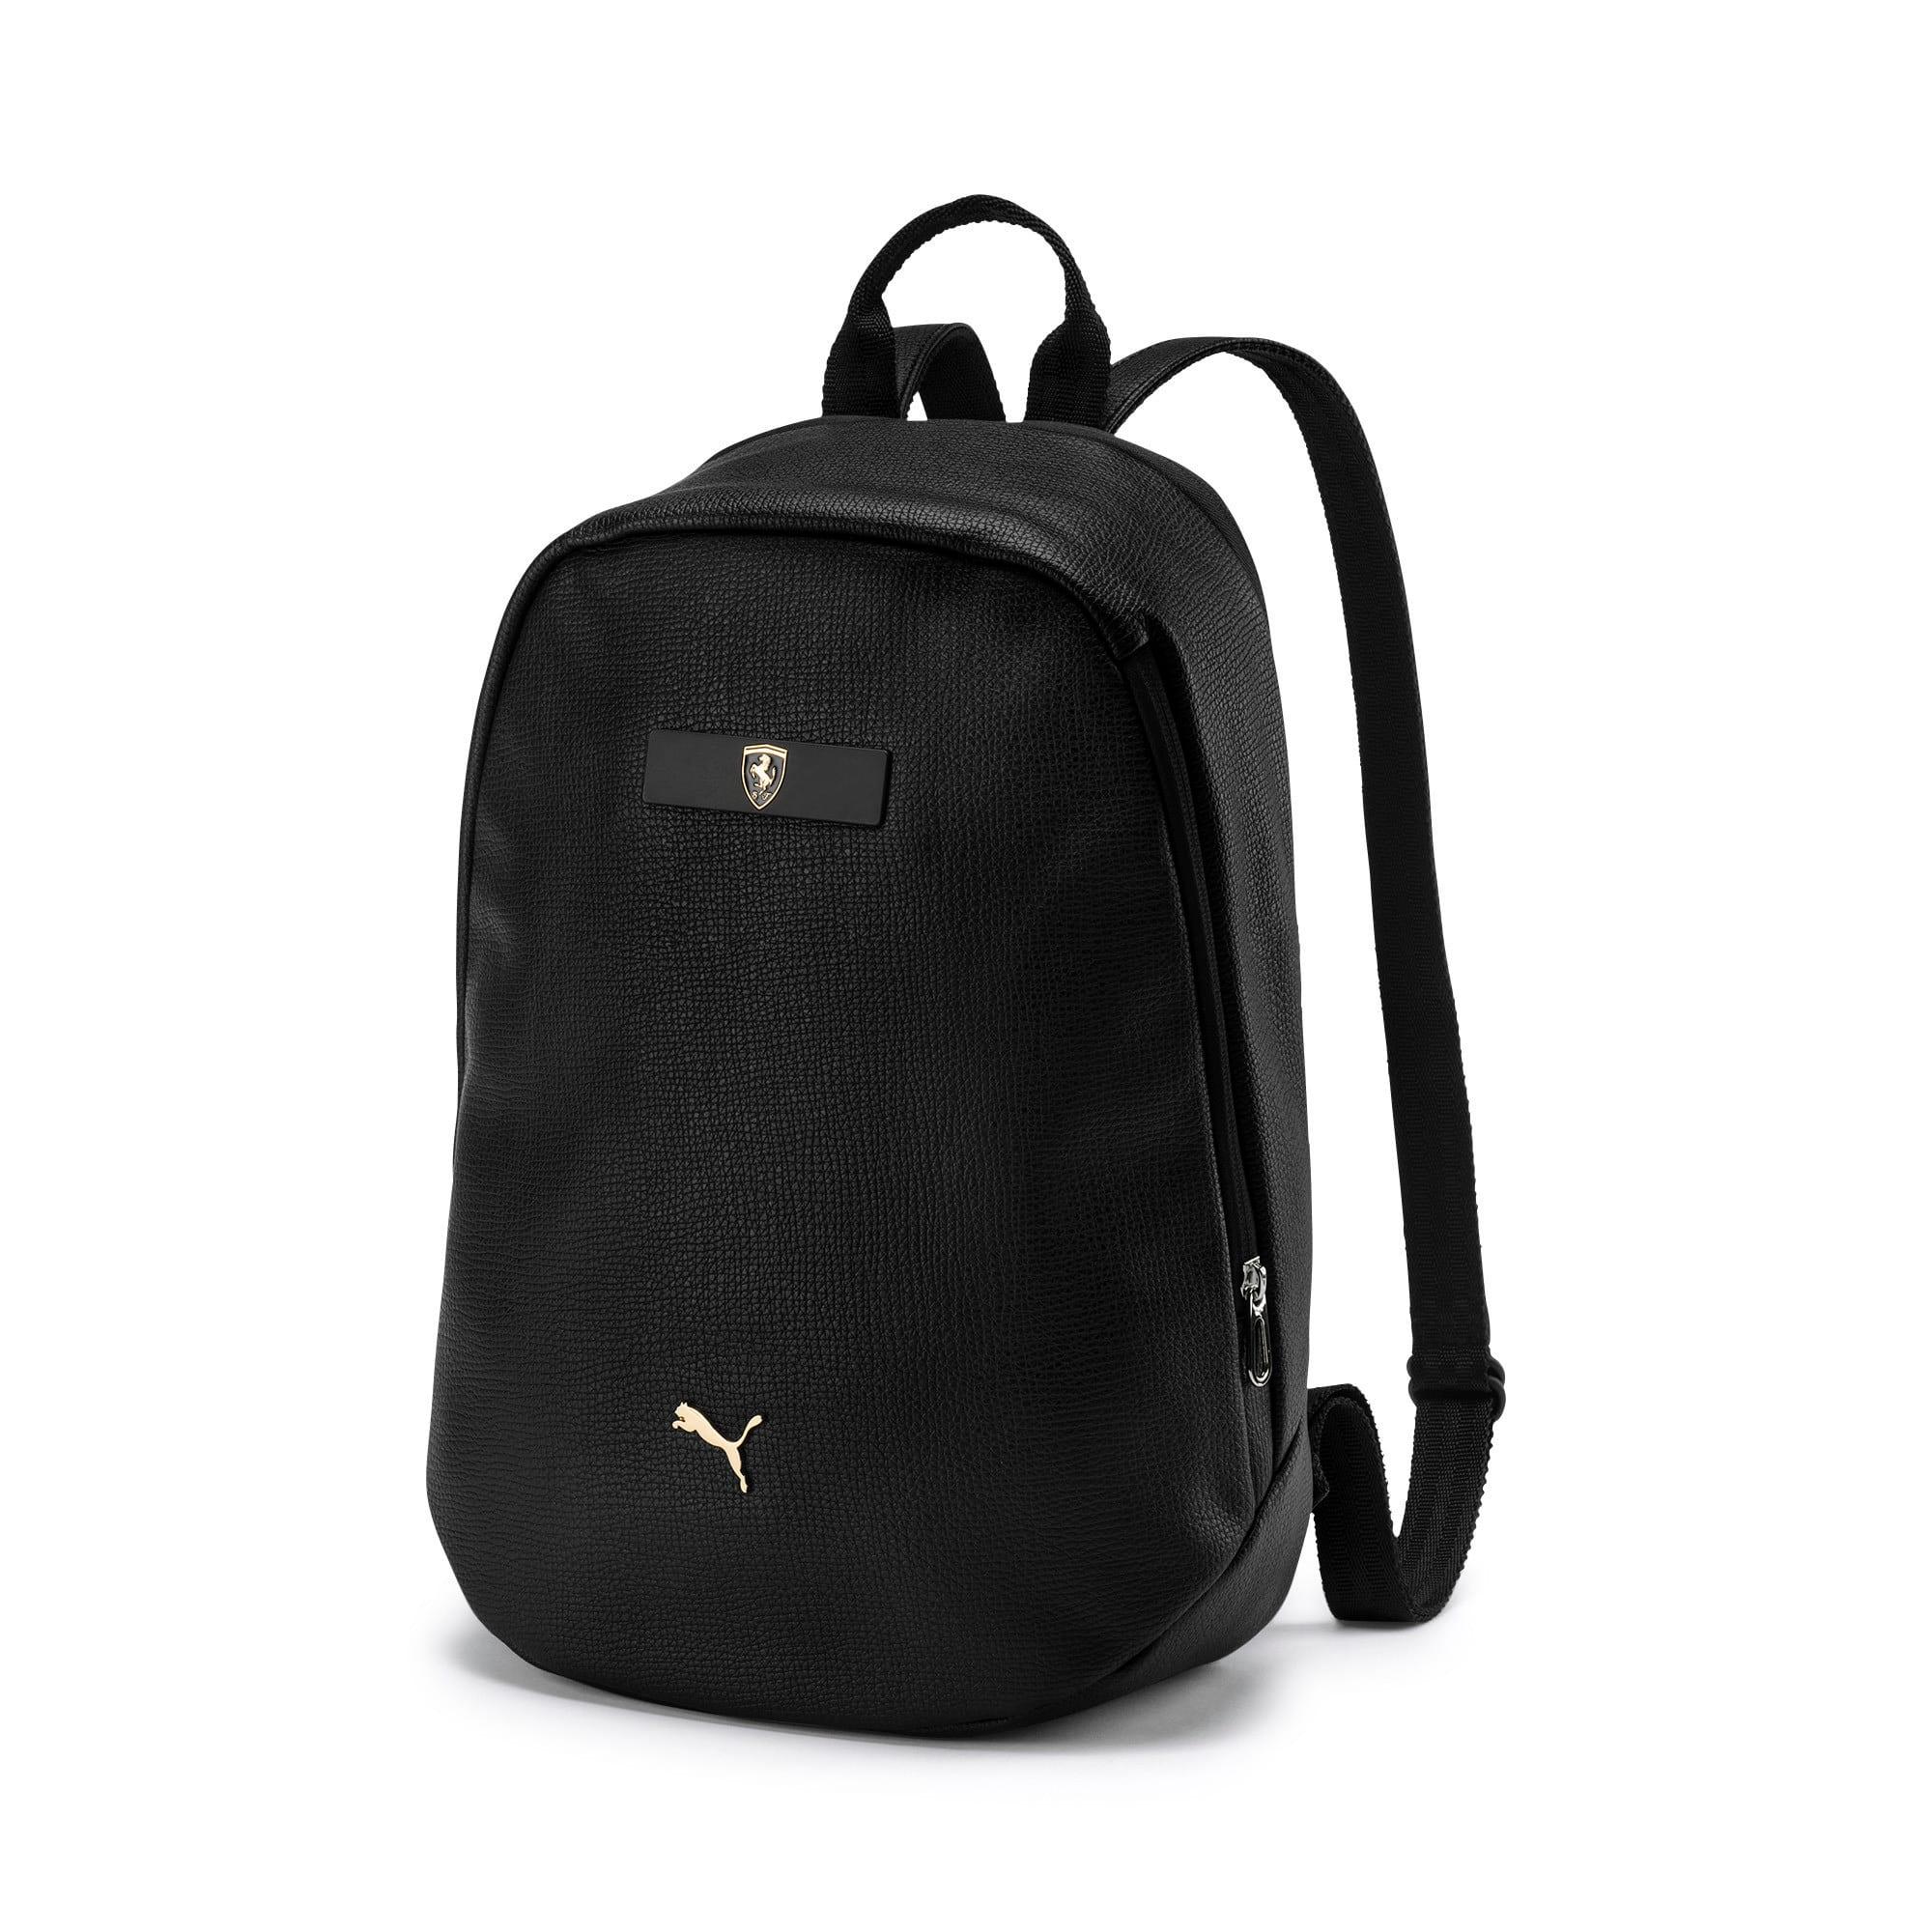 Thumbnail 1 of Ferrari Lifestyle Zainetto Backpack, Puma Black, medium